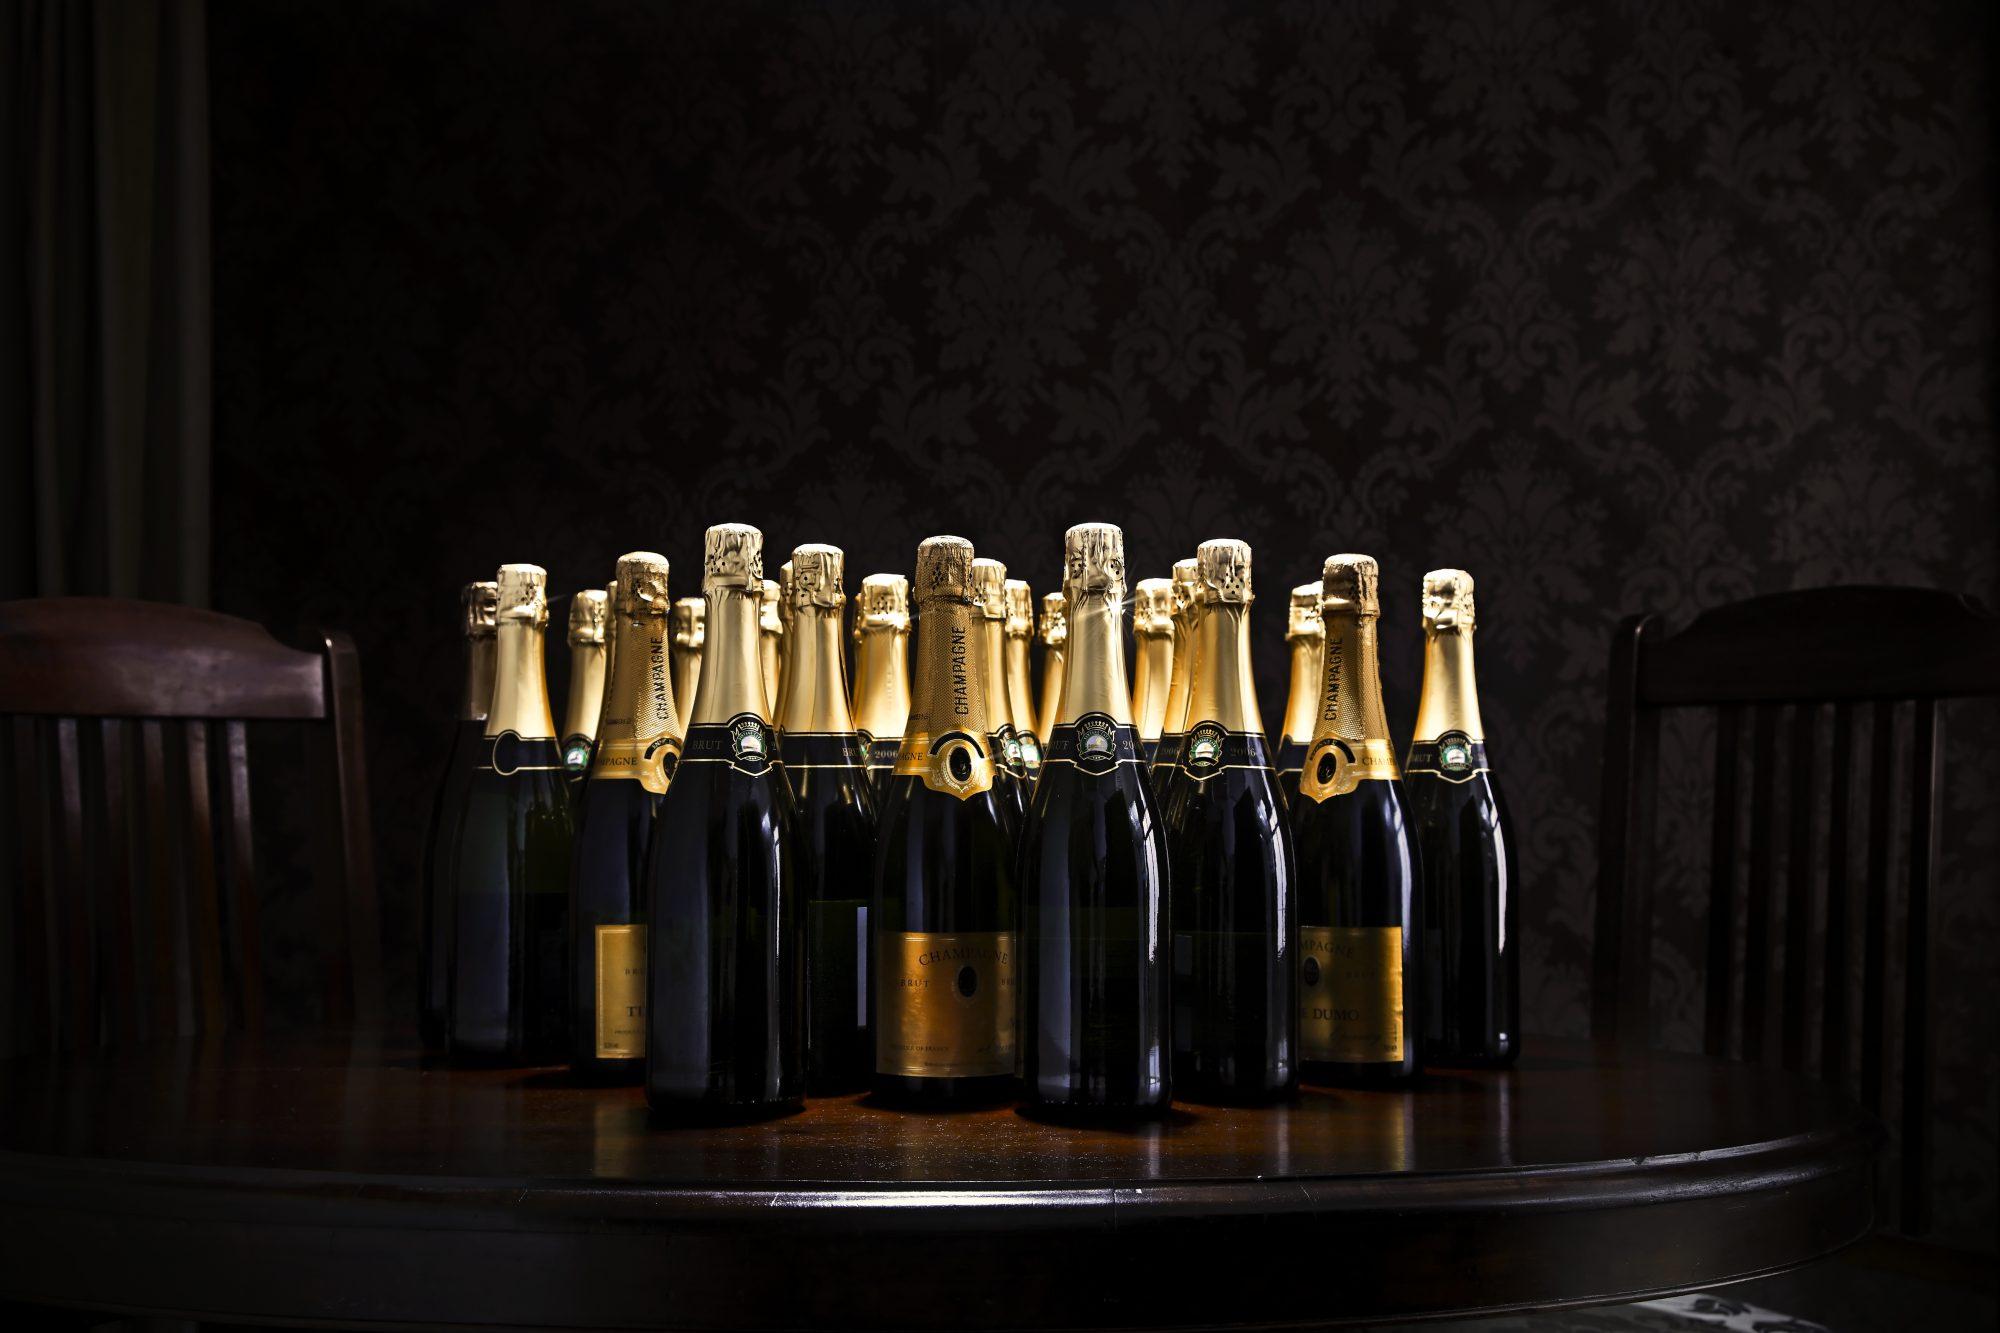 Upright Champagne Getty 9/22/20